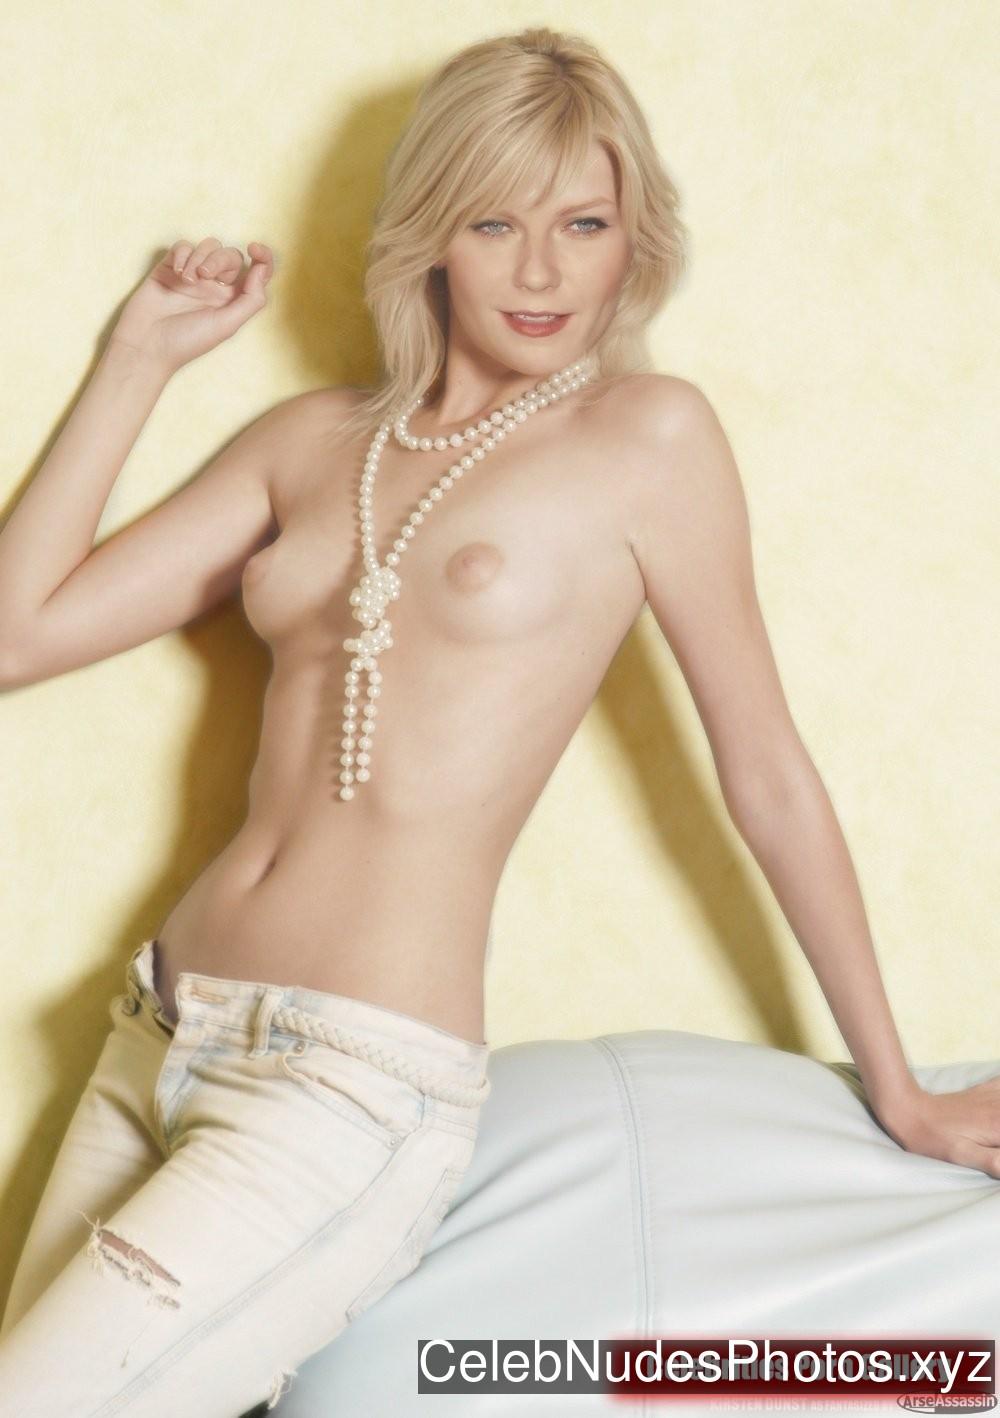 Kirsten Dunst Nude Celebrity Picture sexy 3